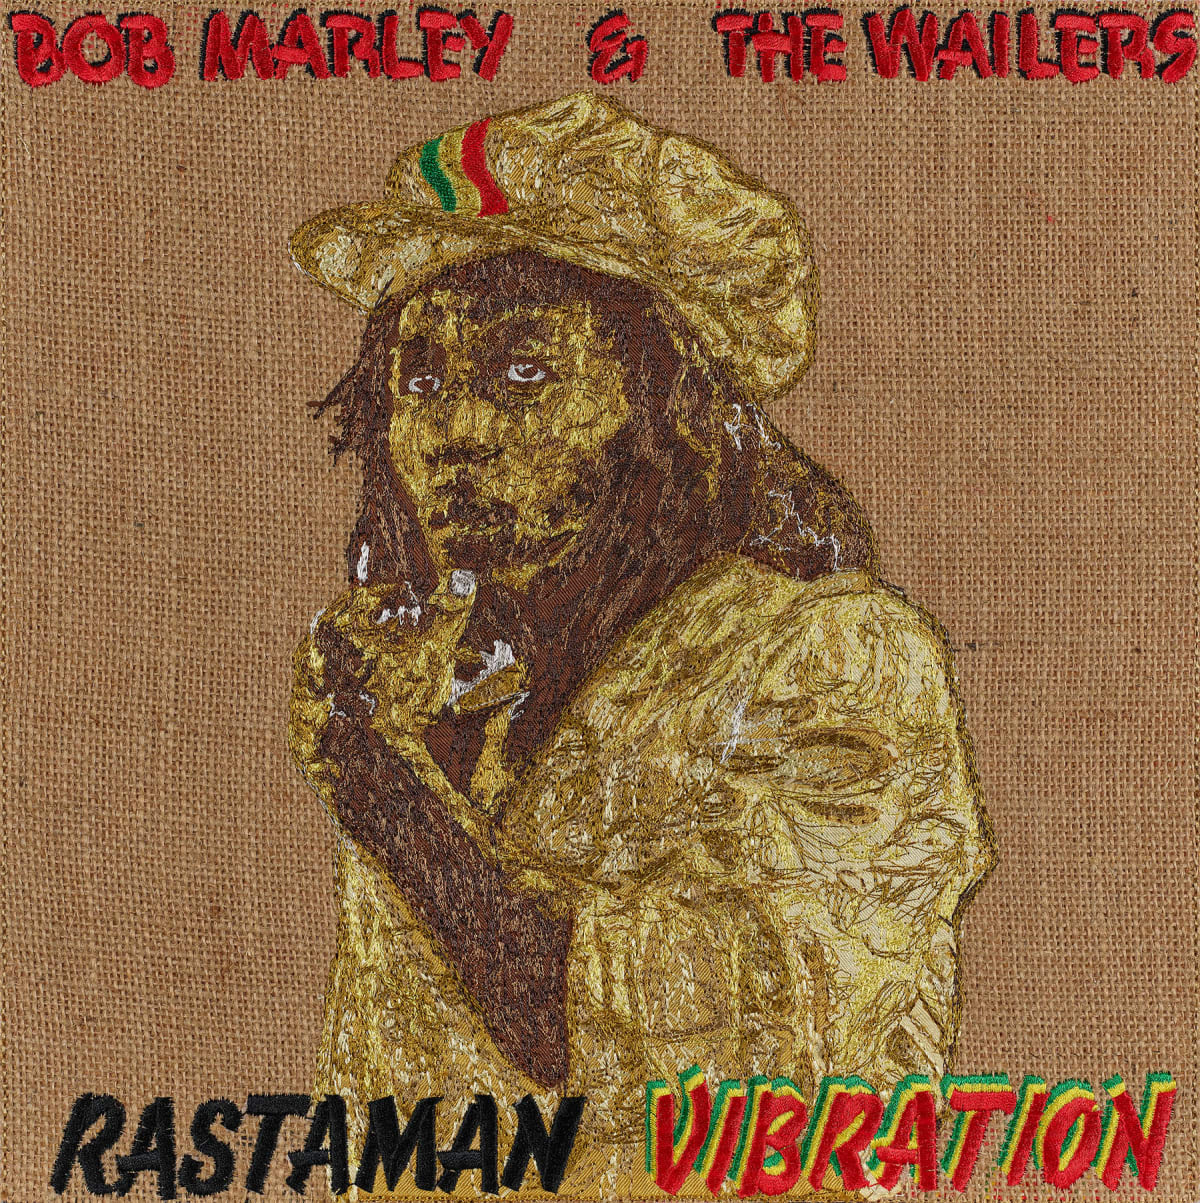 Stephen Wilson, Rastaman Vibration, Bob Marley & the Wailers, 2019